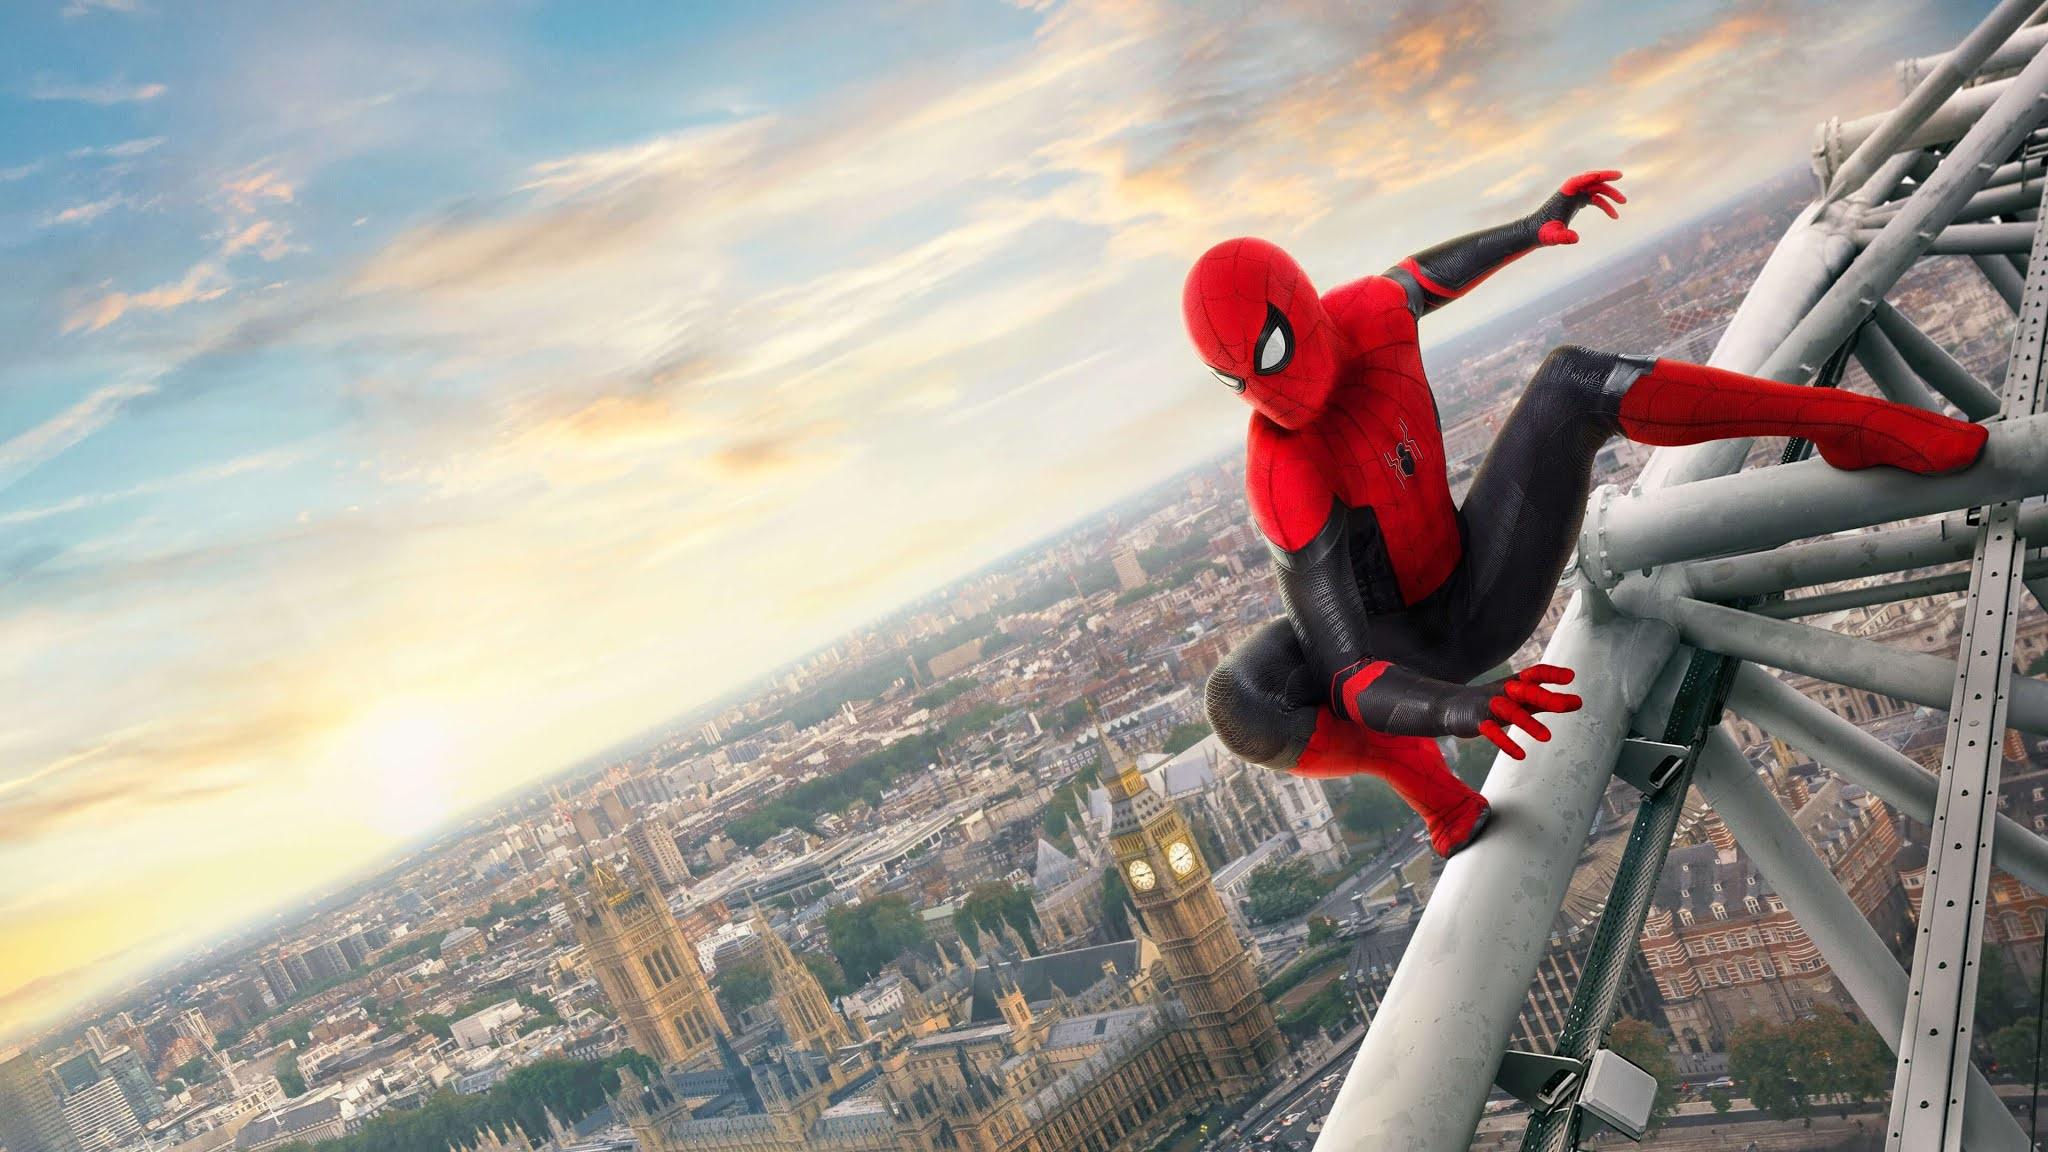 The amazing spider man wallpaper 4k